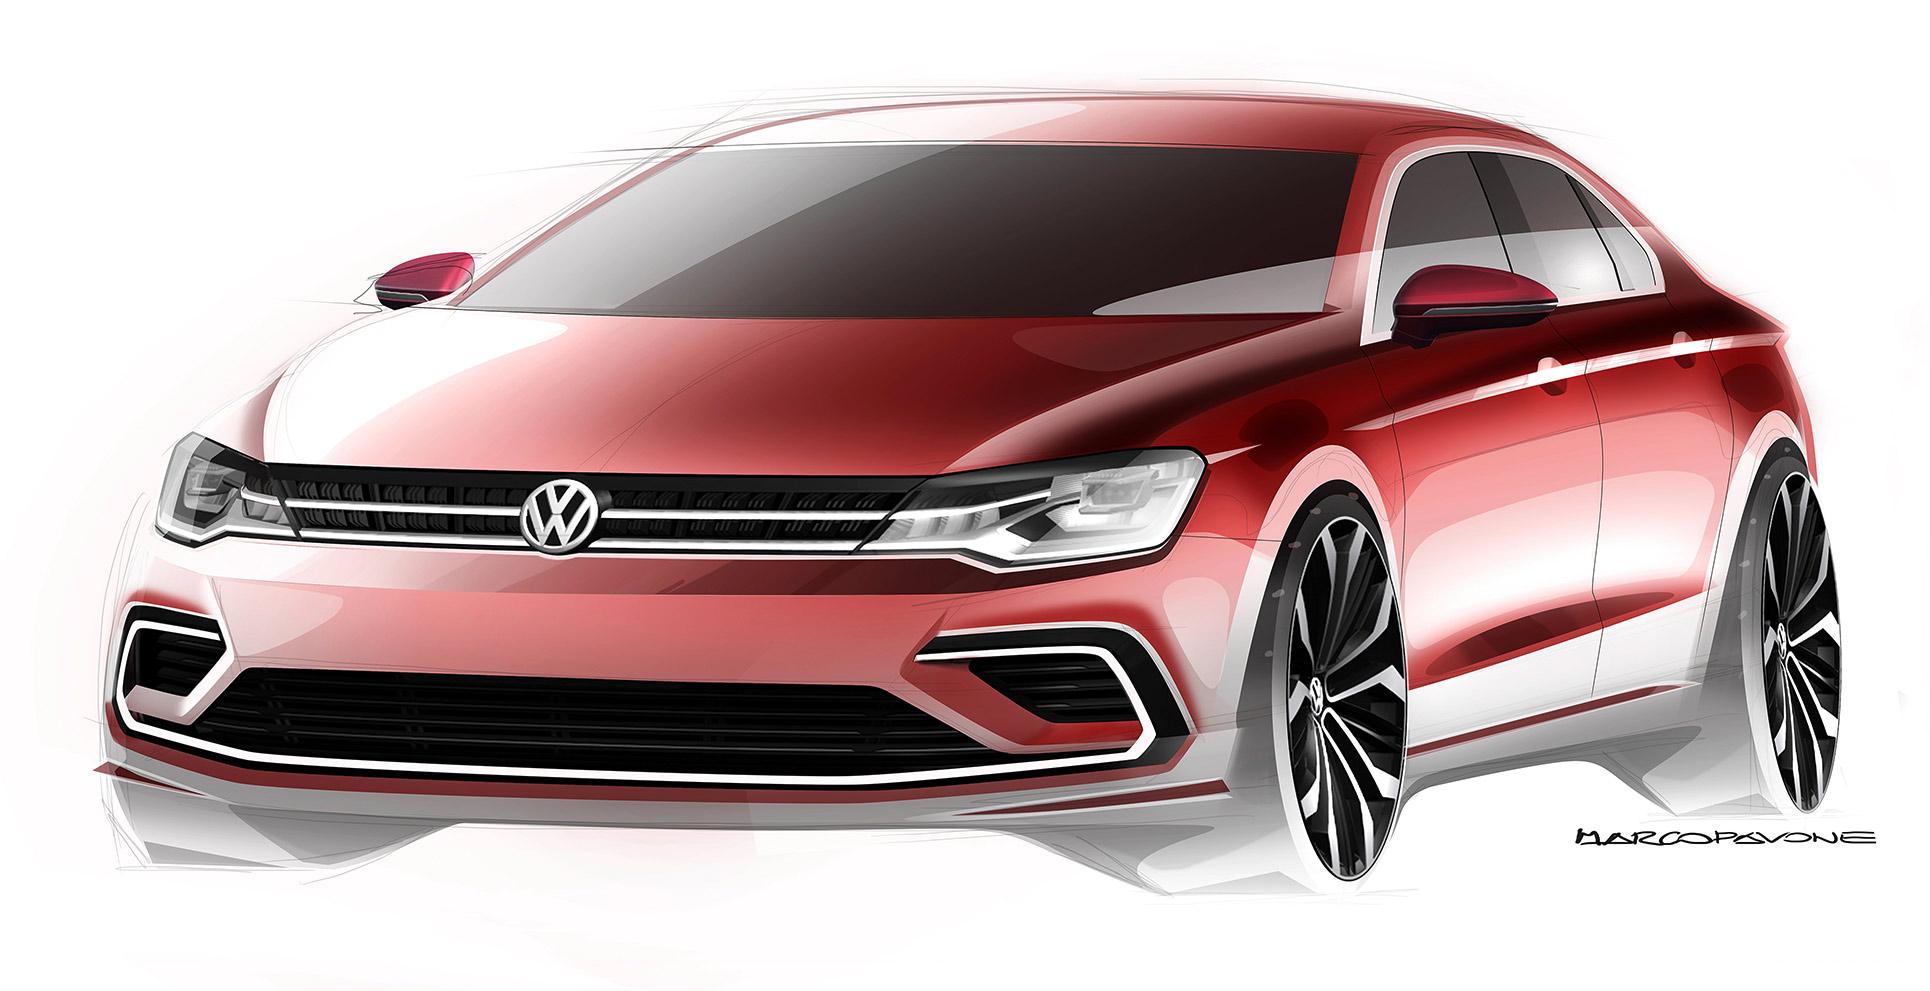 volkswagen-midsize-coupe-concept-9